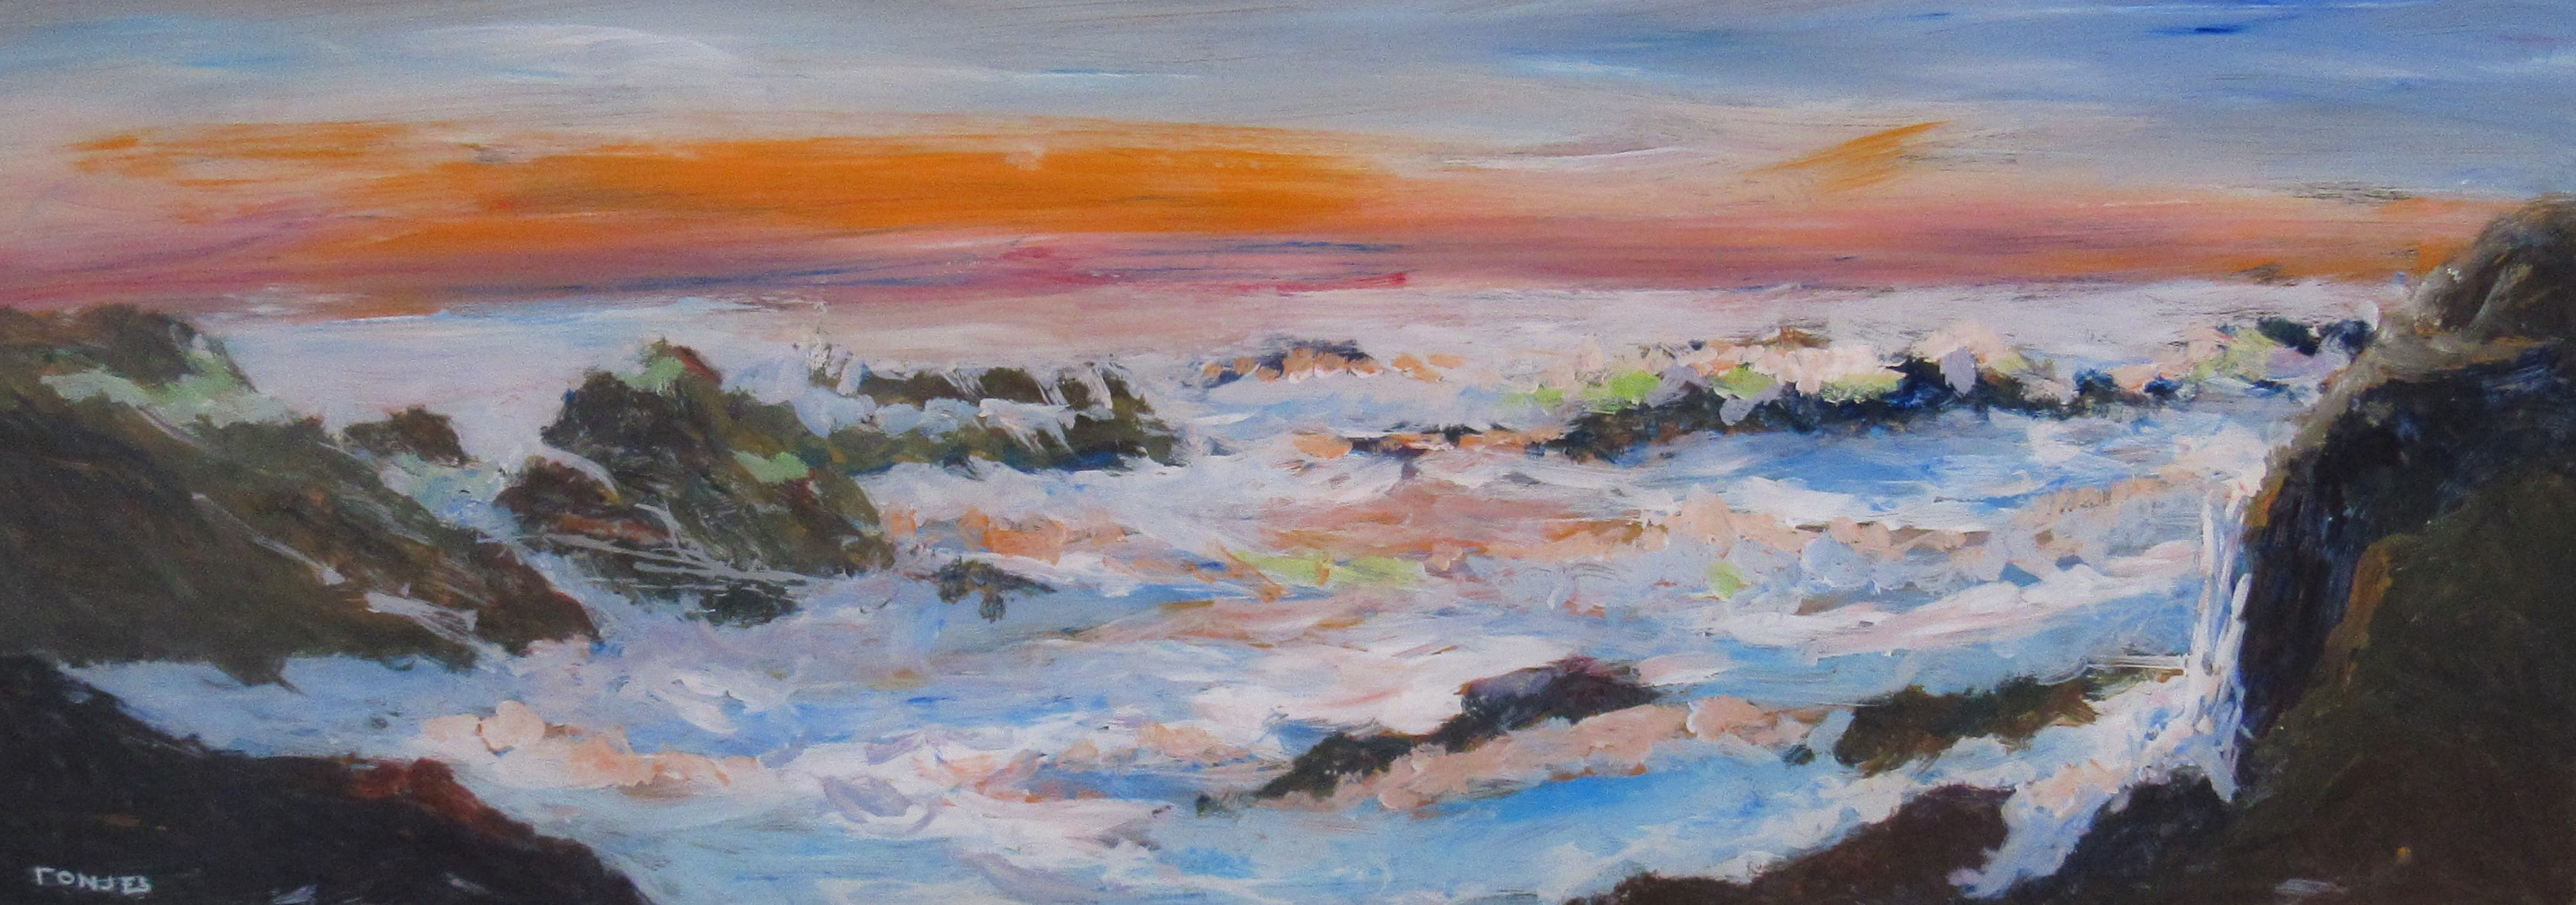 Sunset Glow by Bob Tonjes